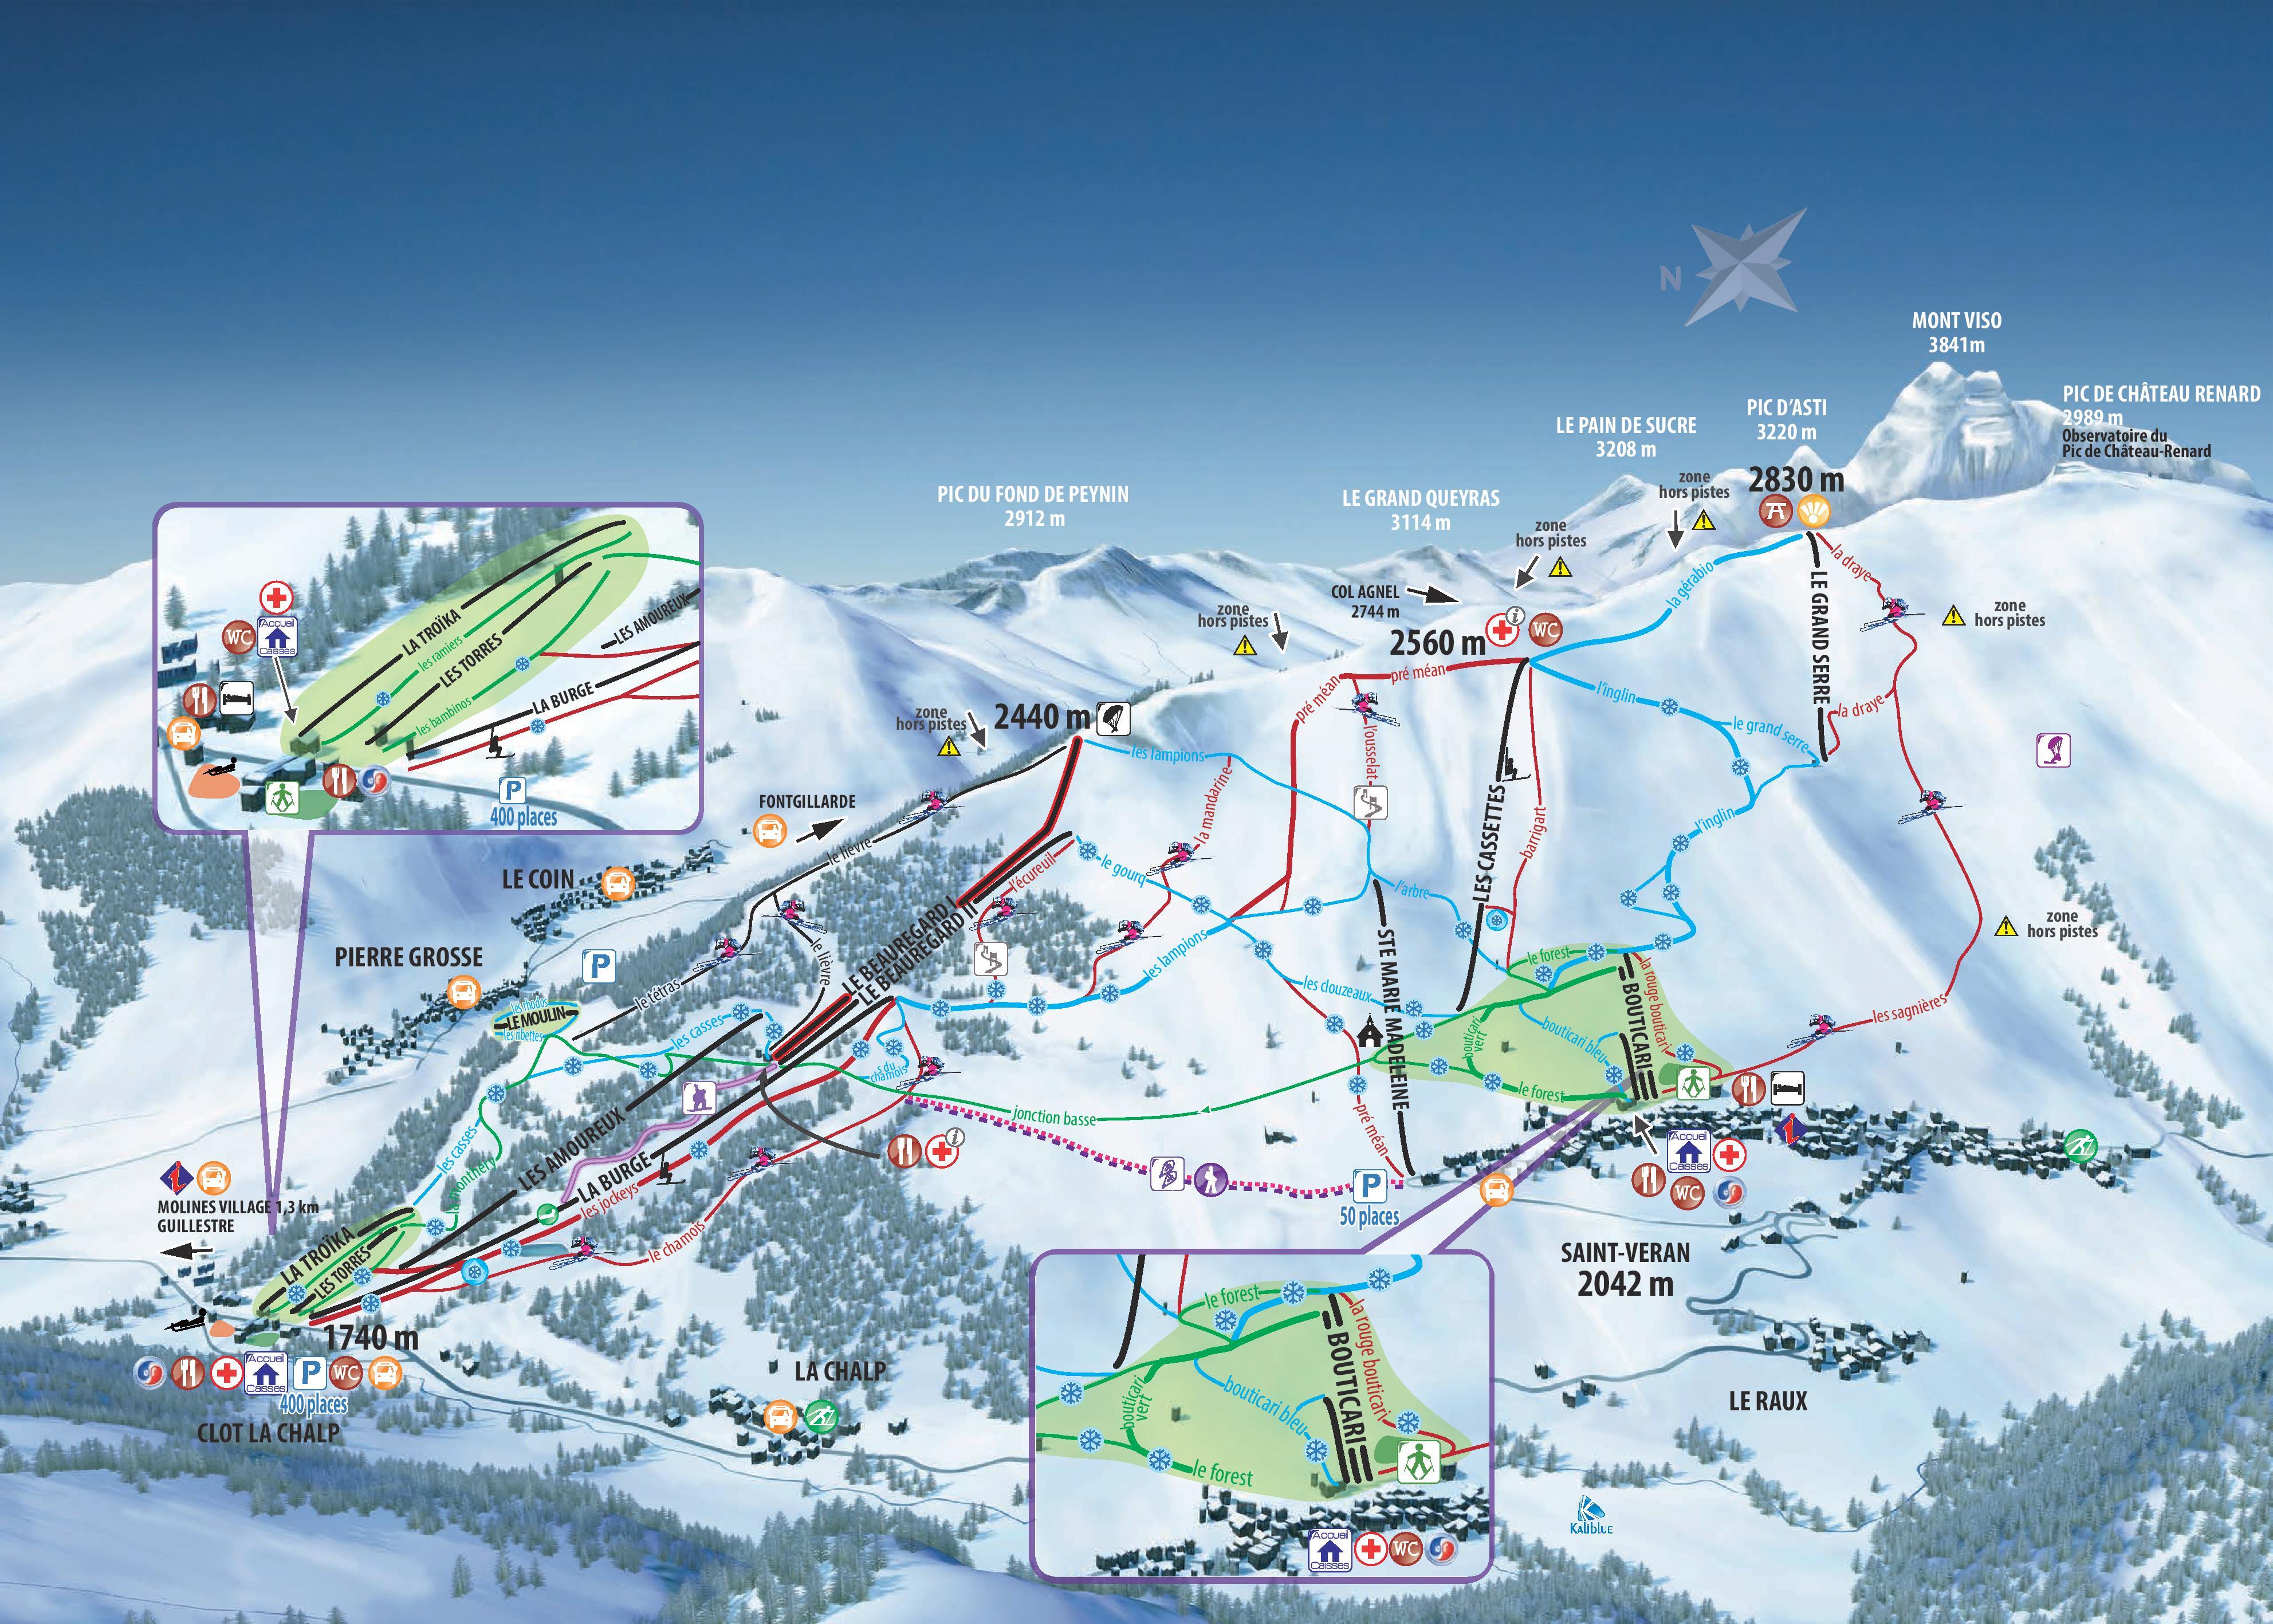 station de ski de molines saint v ran domaine de beauregard hautes alpes alpes du sud. Black Bedroom Furniture Sets. Home Design Ideas